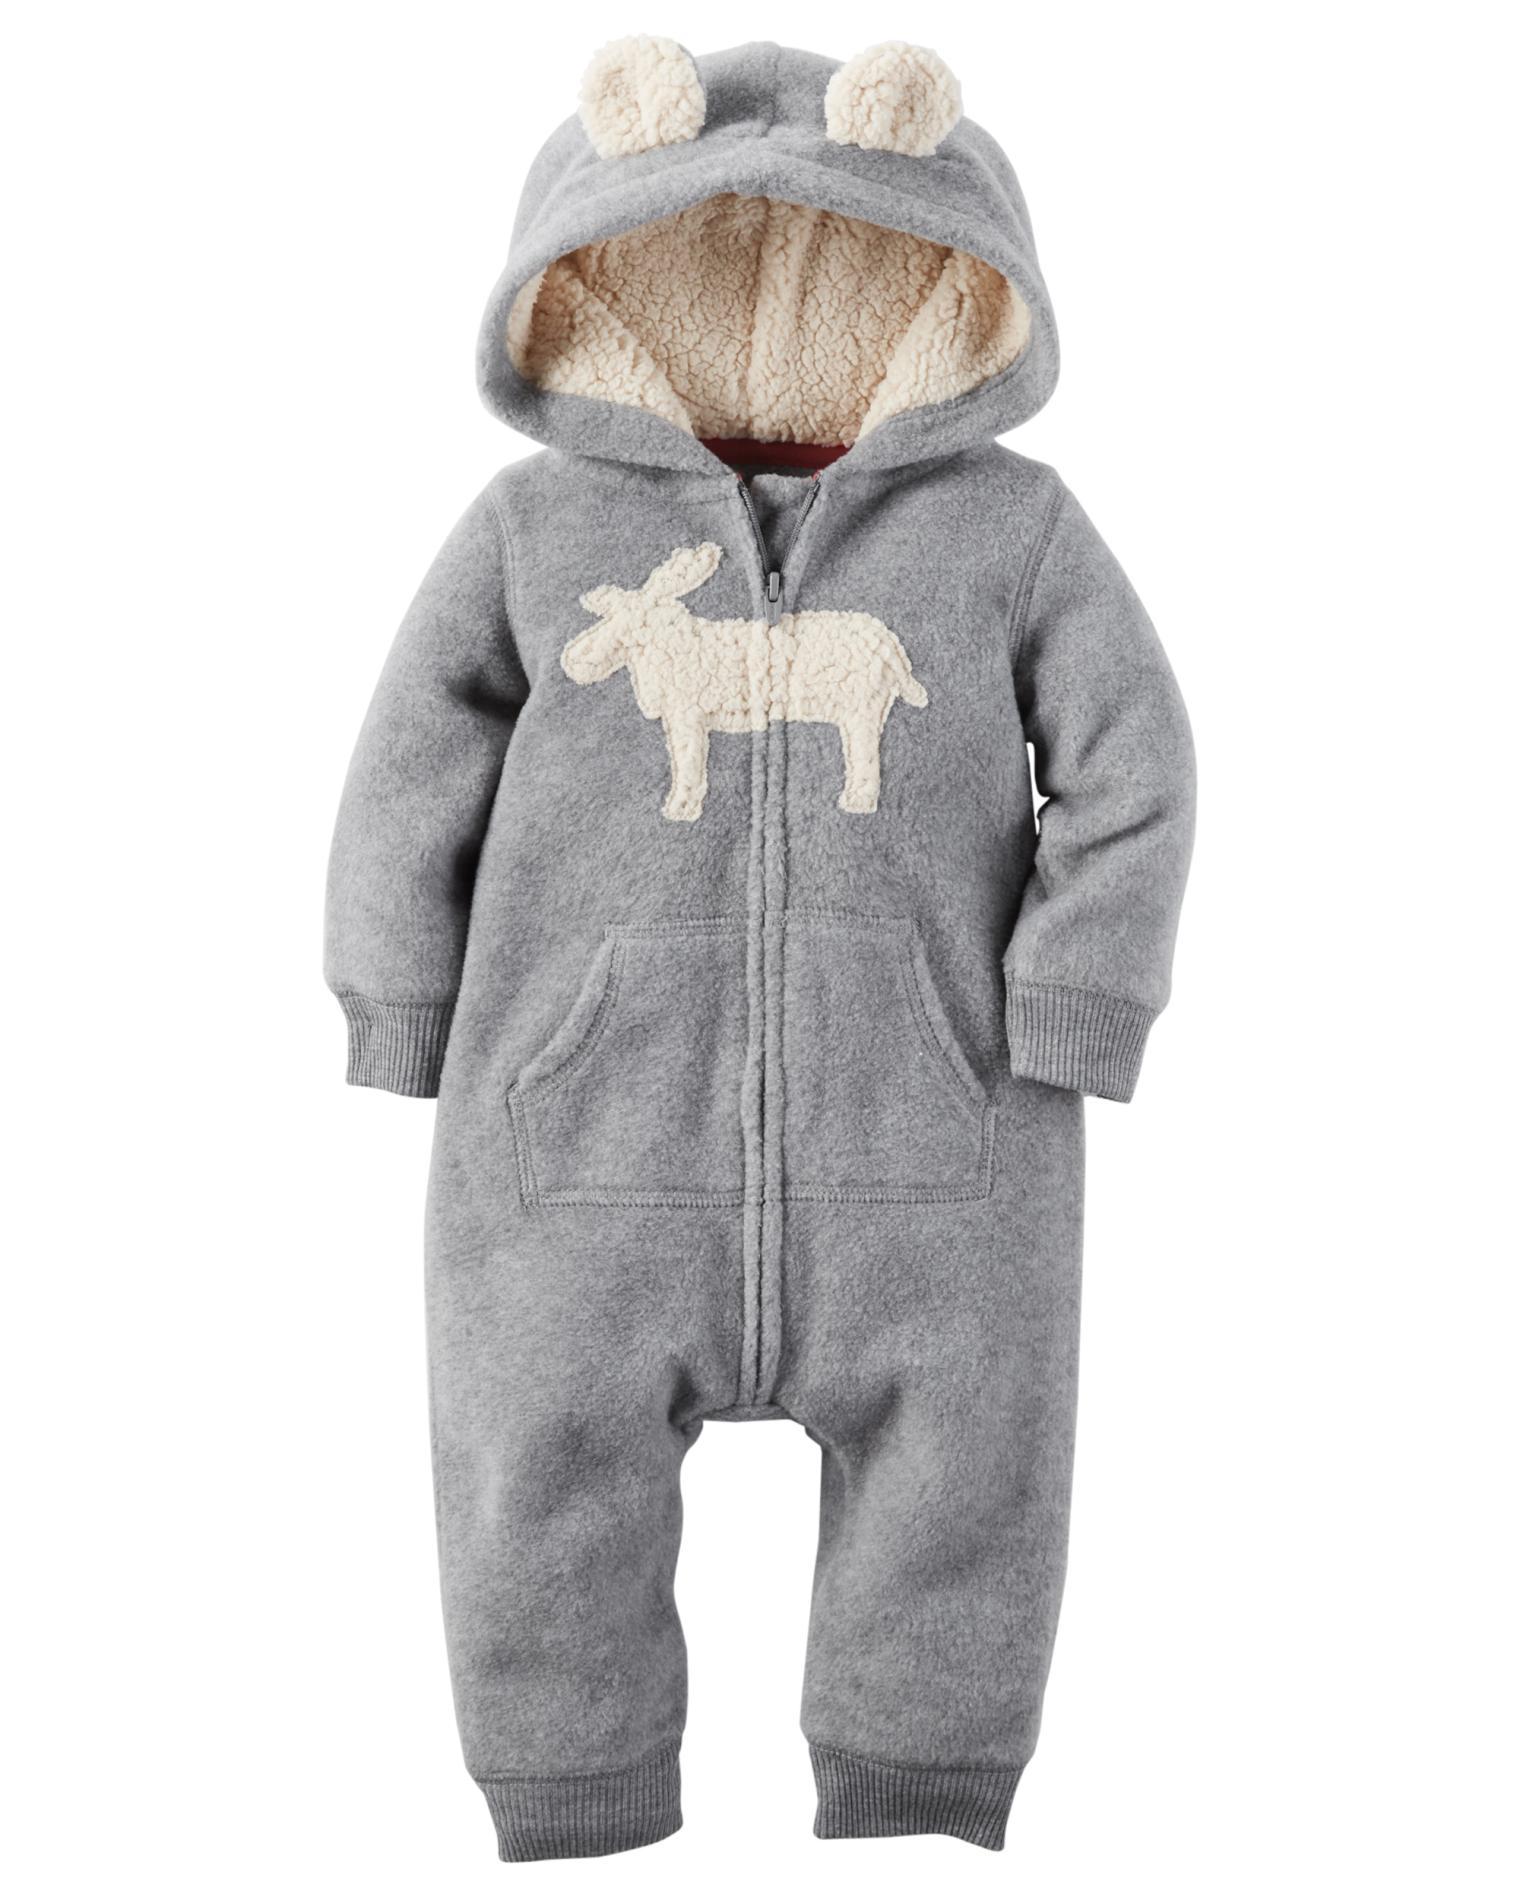 Carter' Newborn & Infant Boys' Pram Suit - Moose